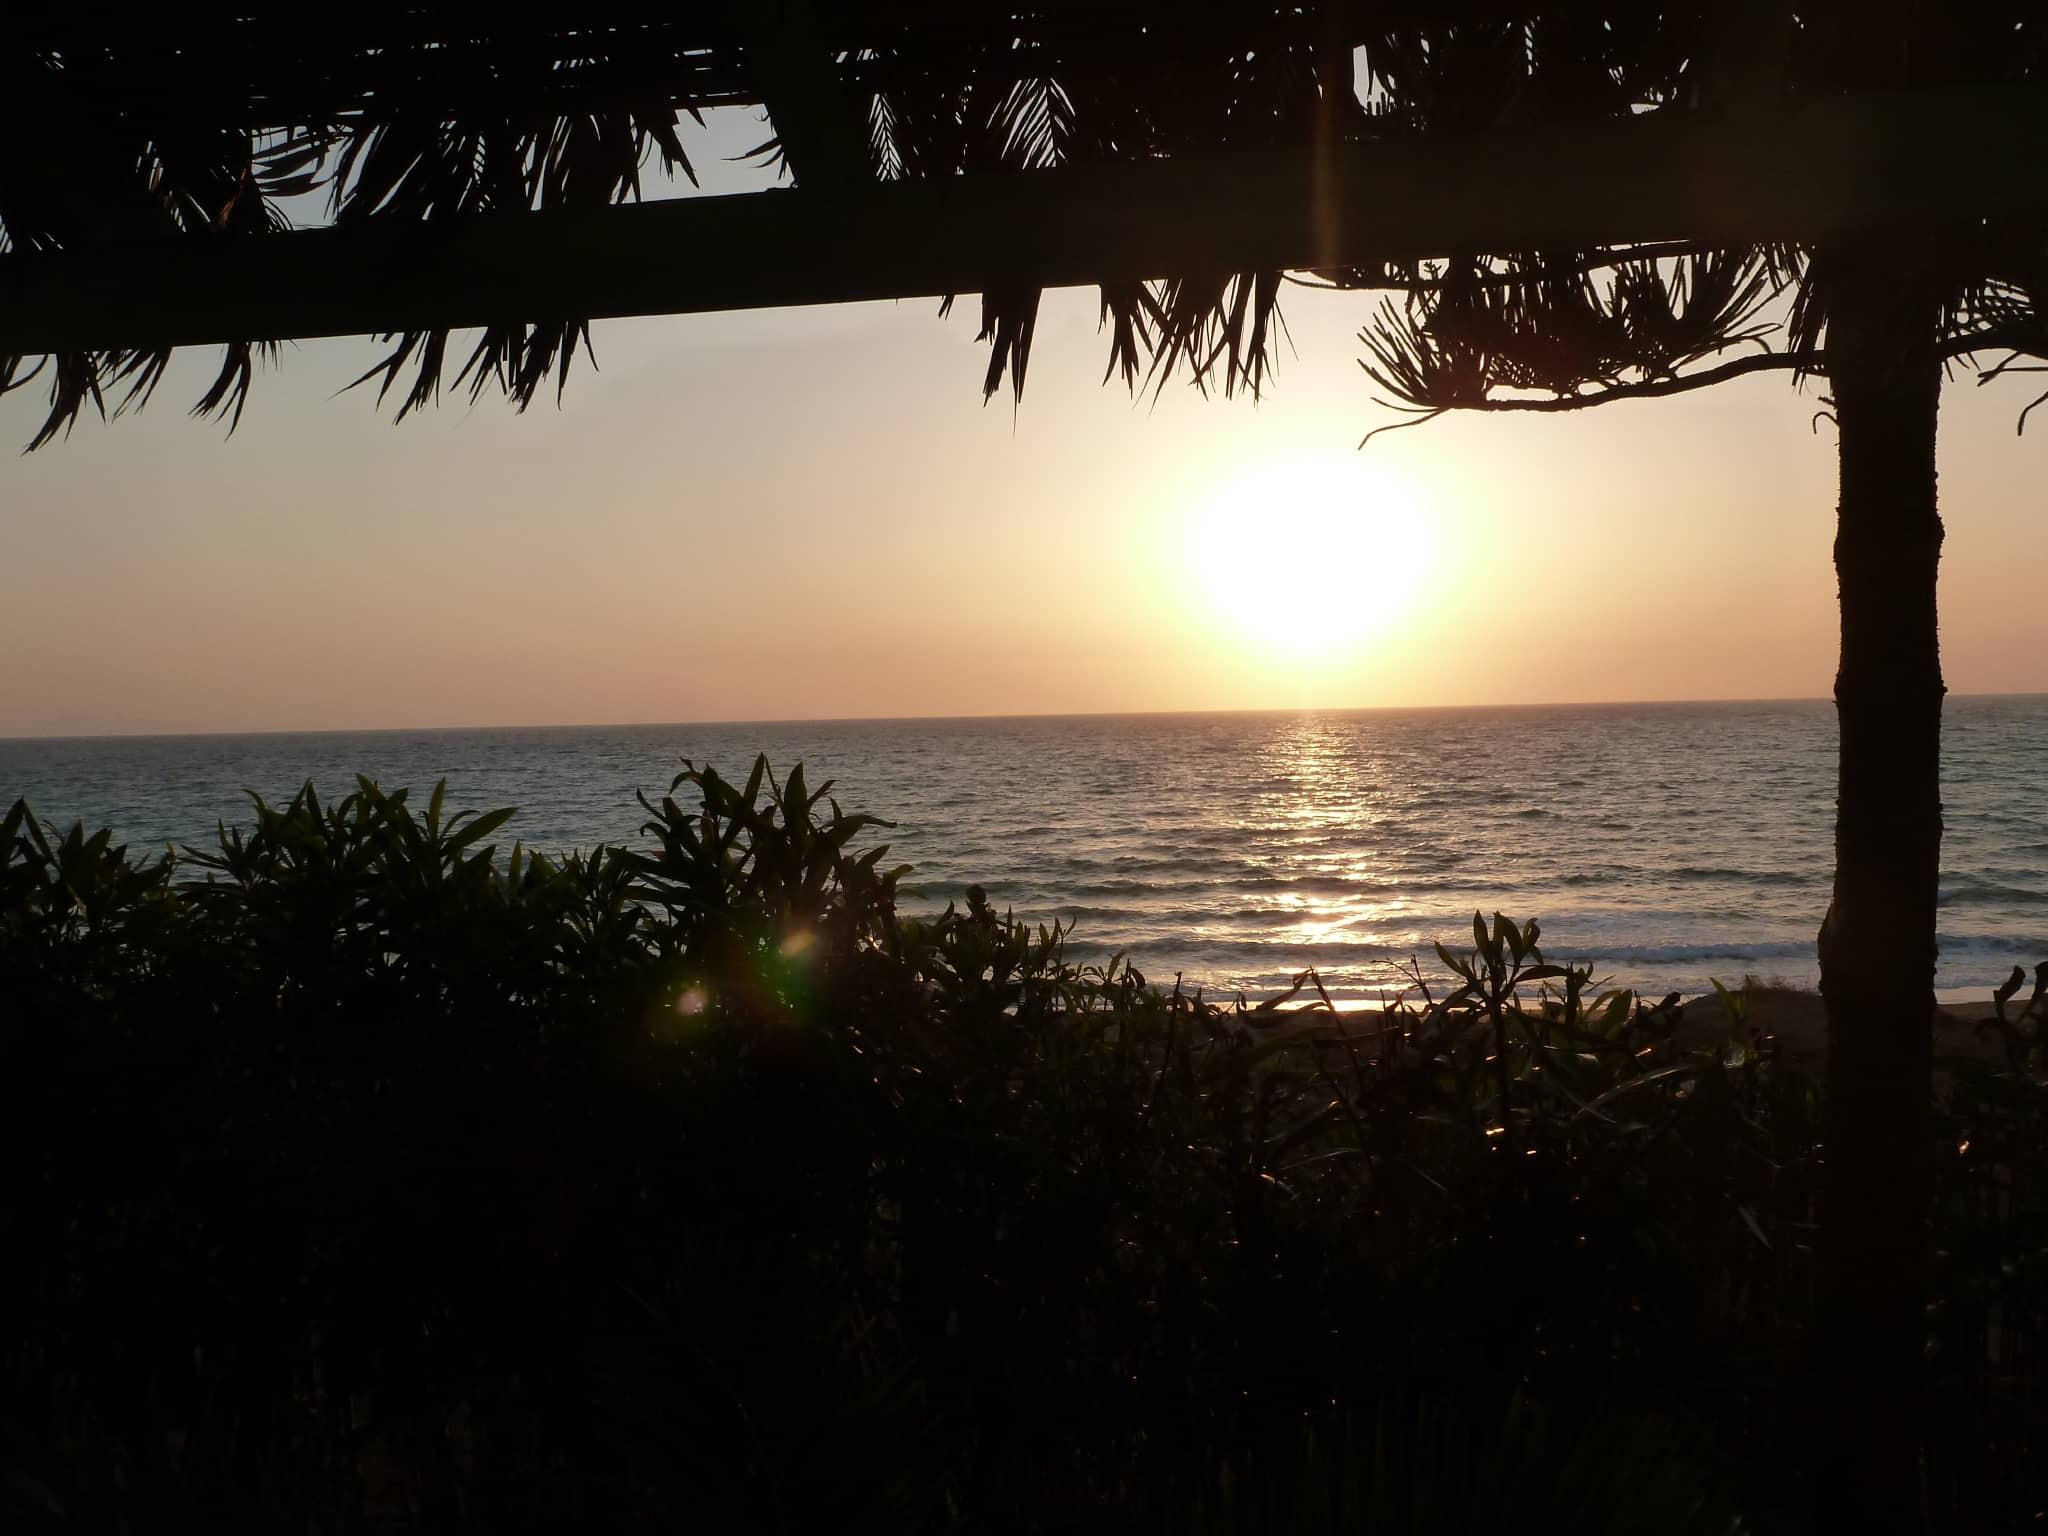 Sonnenuntergang-Rhodos-Reiseblog-Reisetipps-travelblog